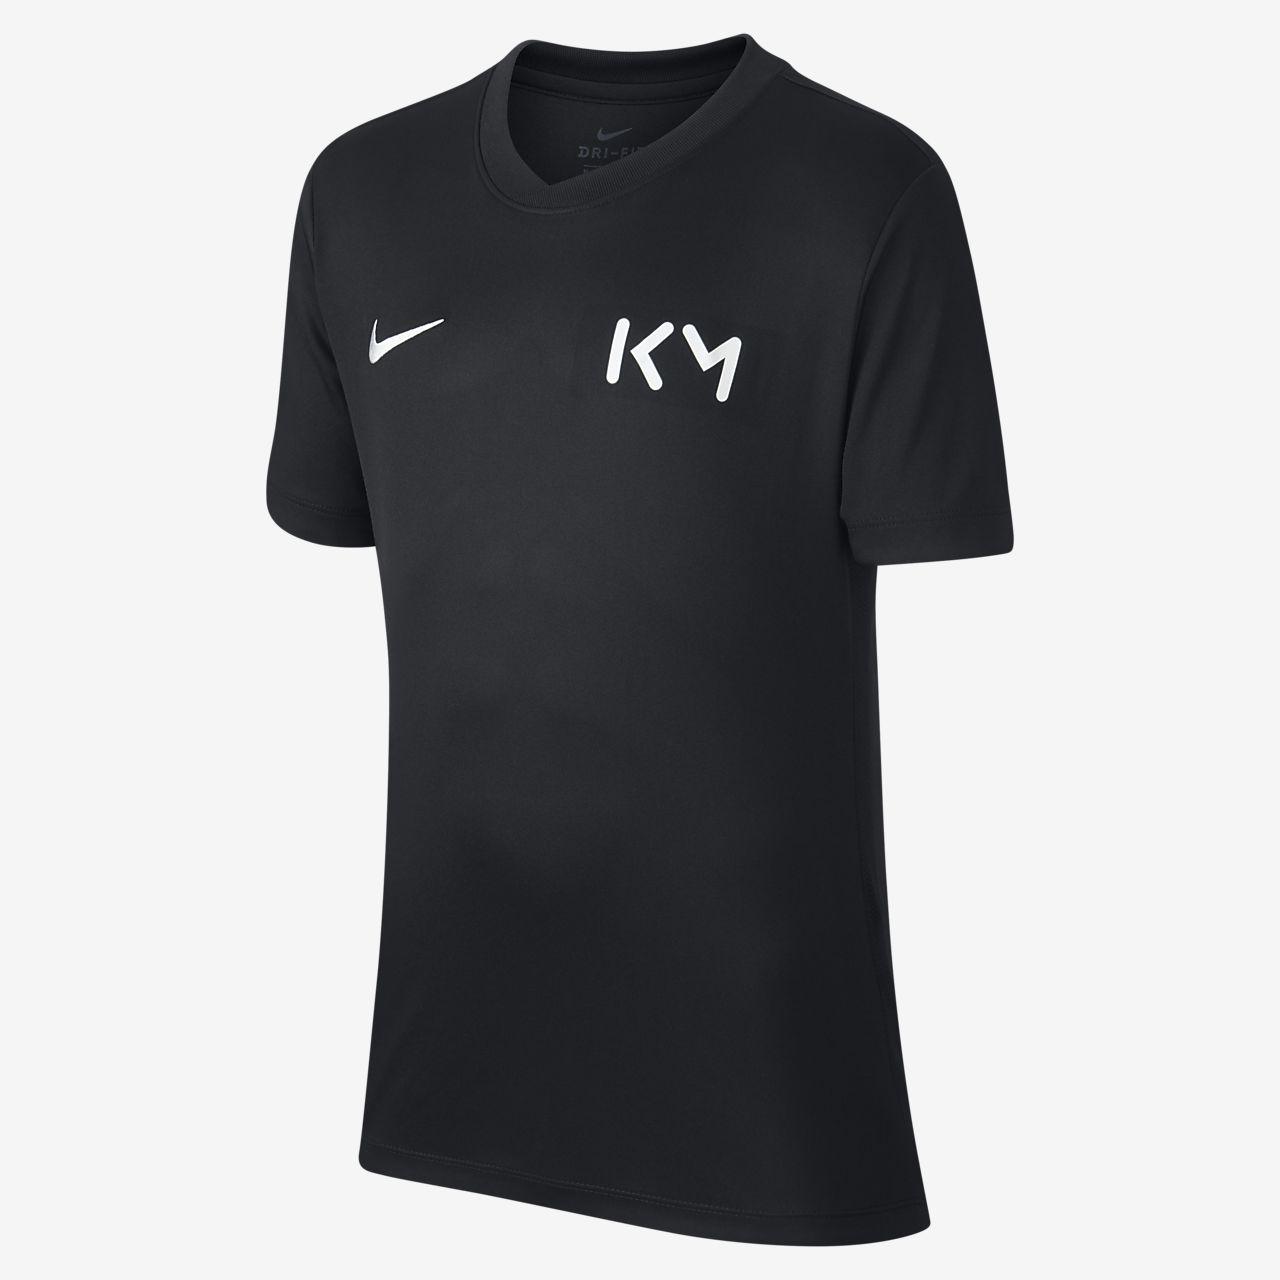 Kylian Mbappé Fußballtrikot für ältere Kinder